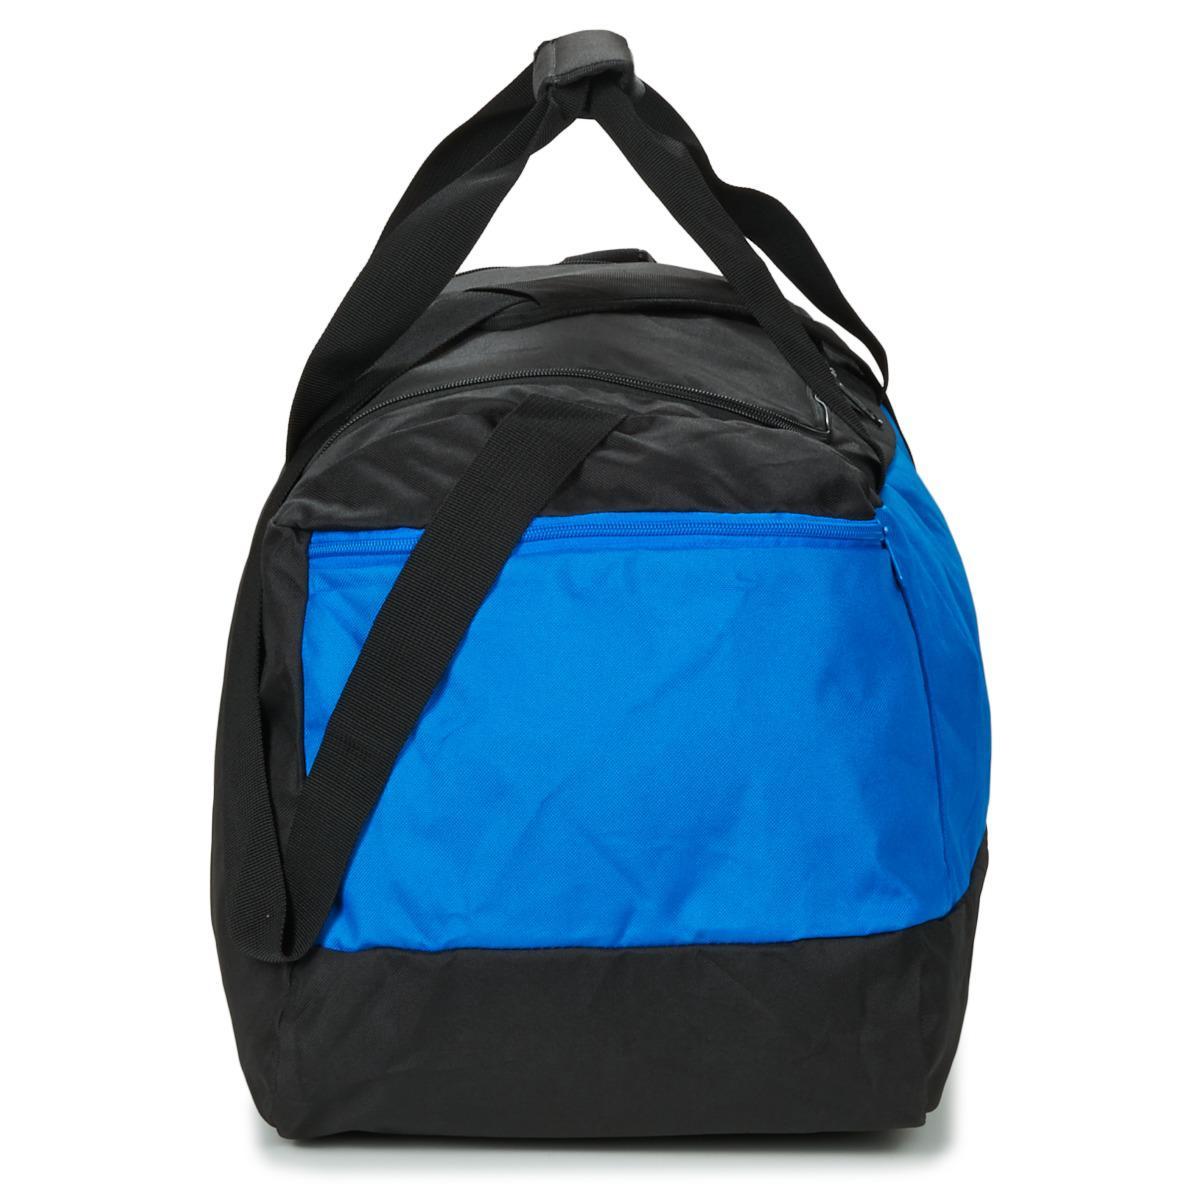 PUMA Pro Training Ii Medium Bag Men s Sports Bag In Black in Black ... faa7e11c931bc